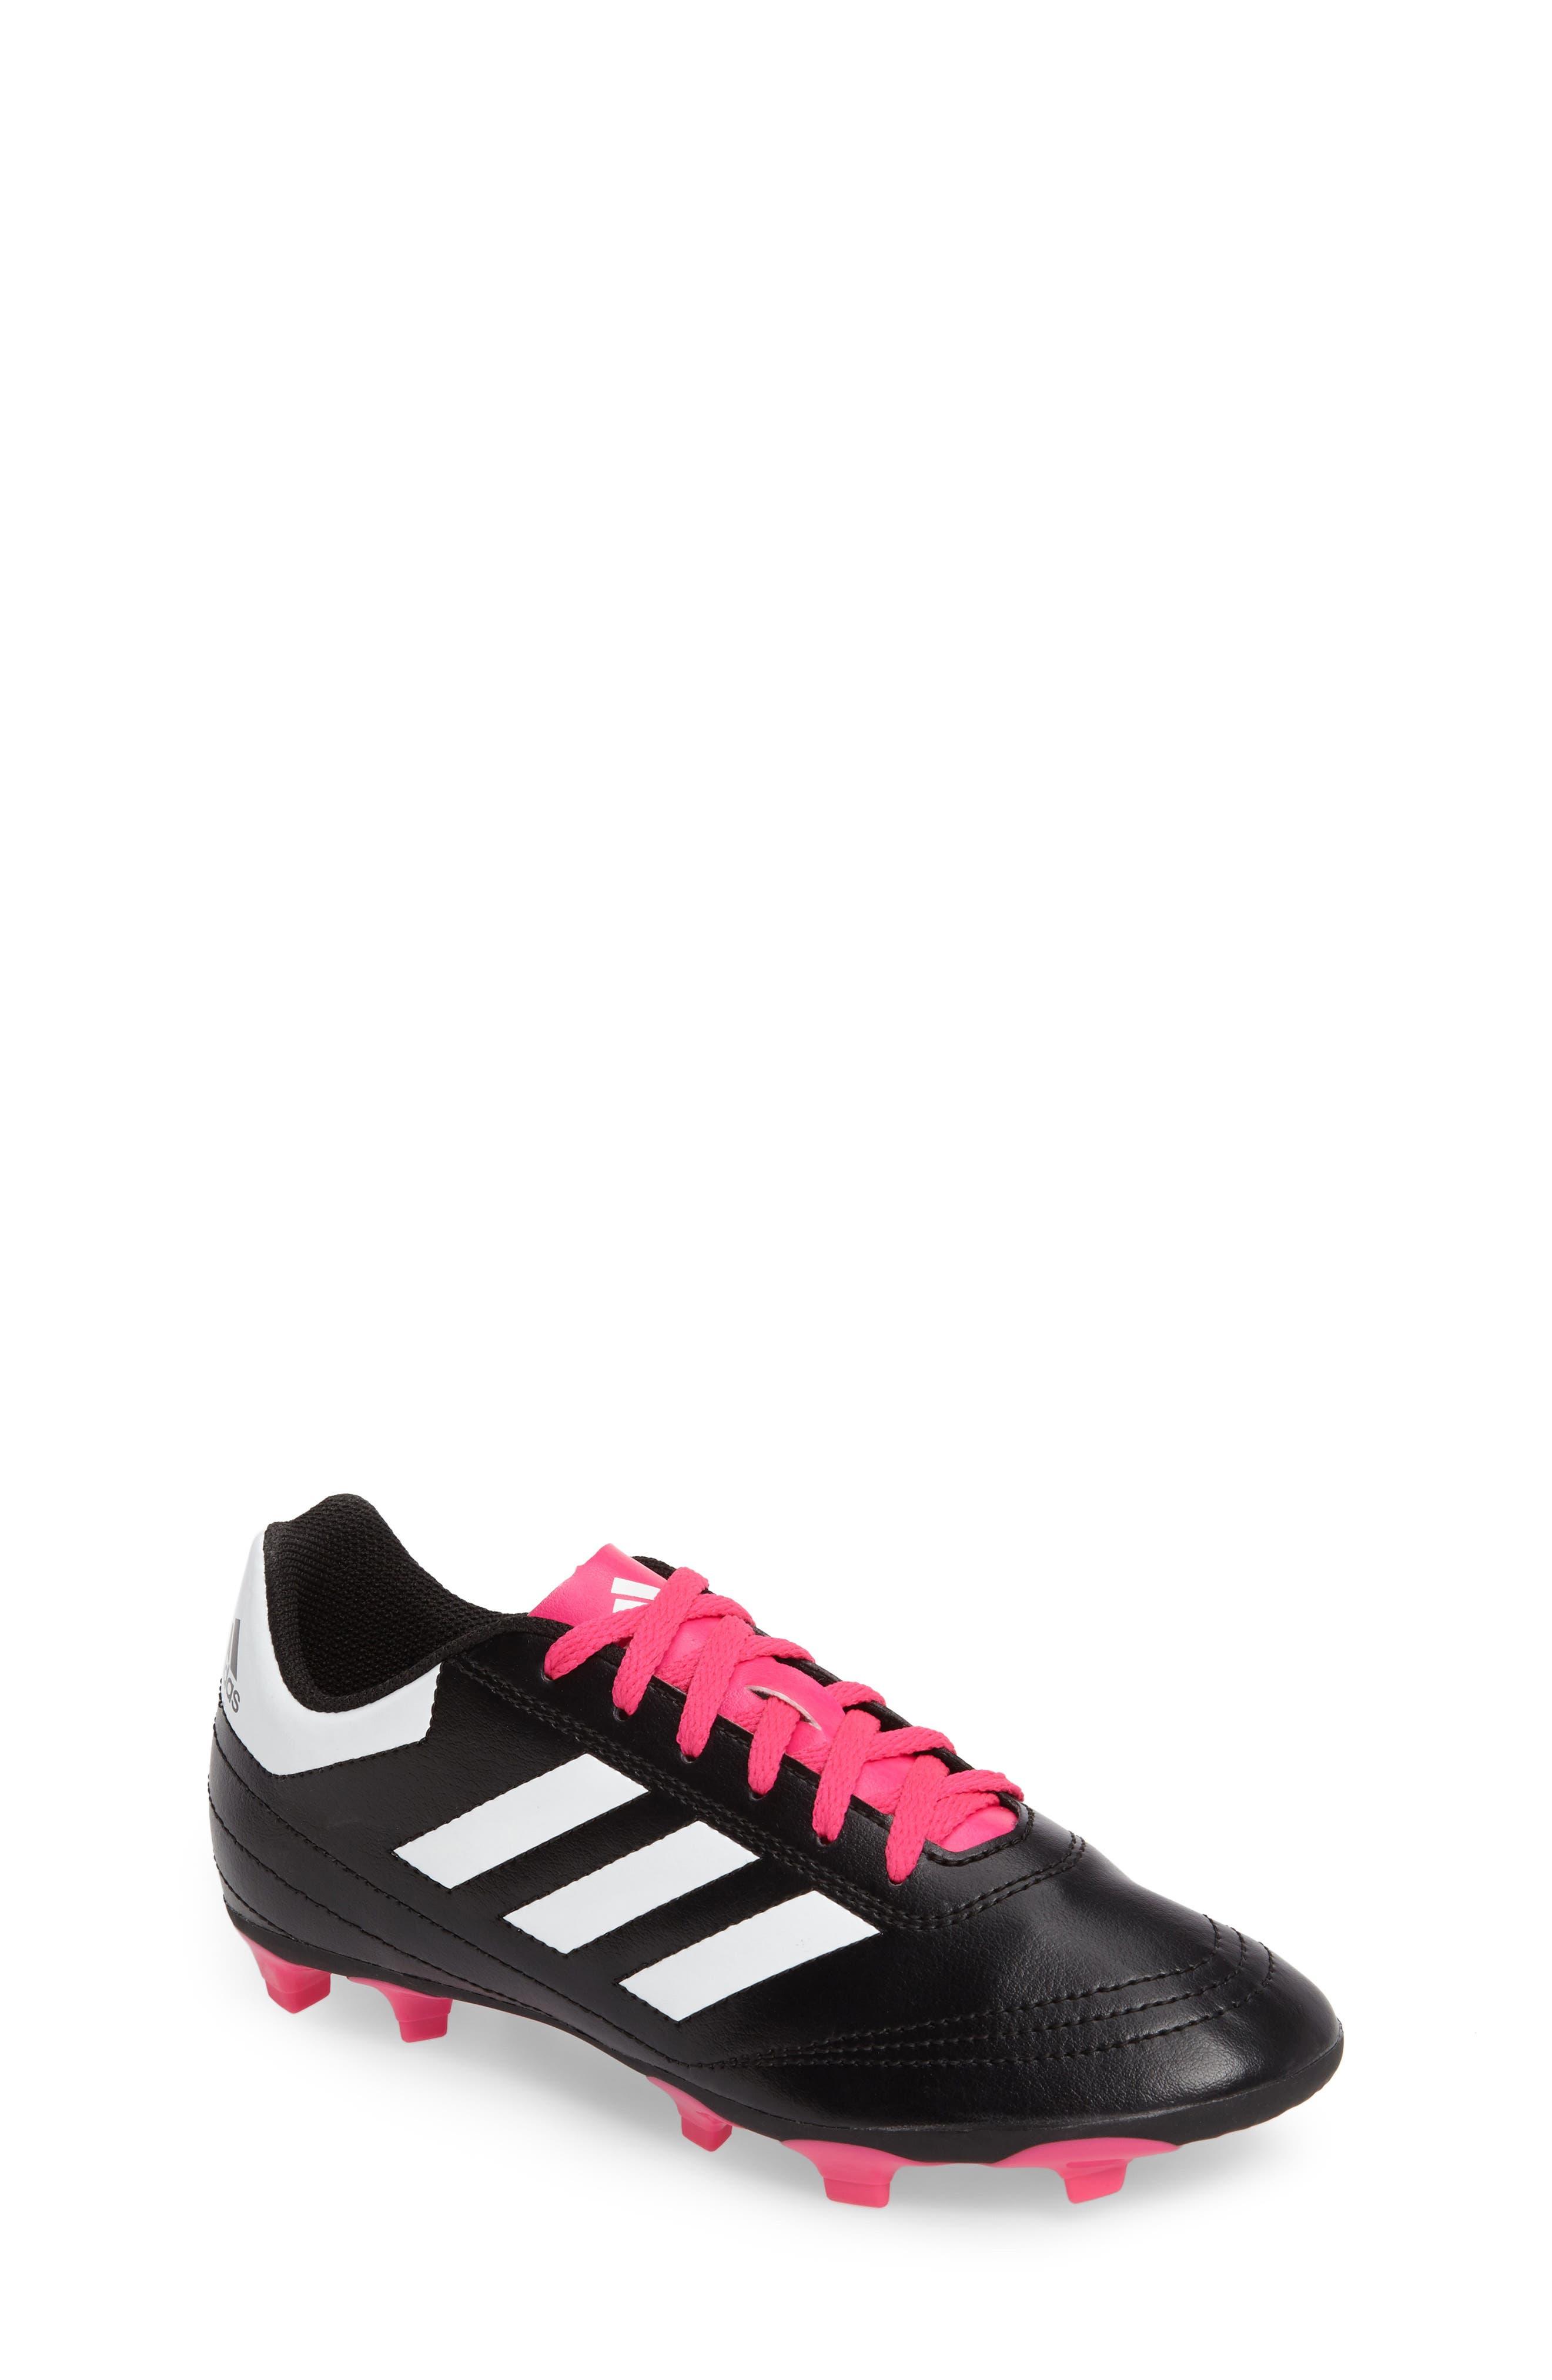 Goletto VI Soccer Shoe,                             Main thumbnail 1, color,                             CORE BLACK/ WHITE/ SHOCK PINK